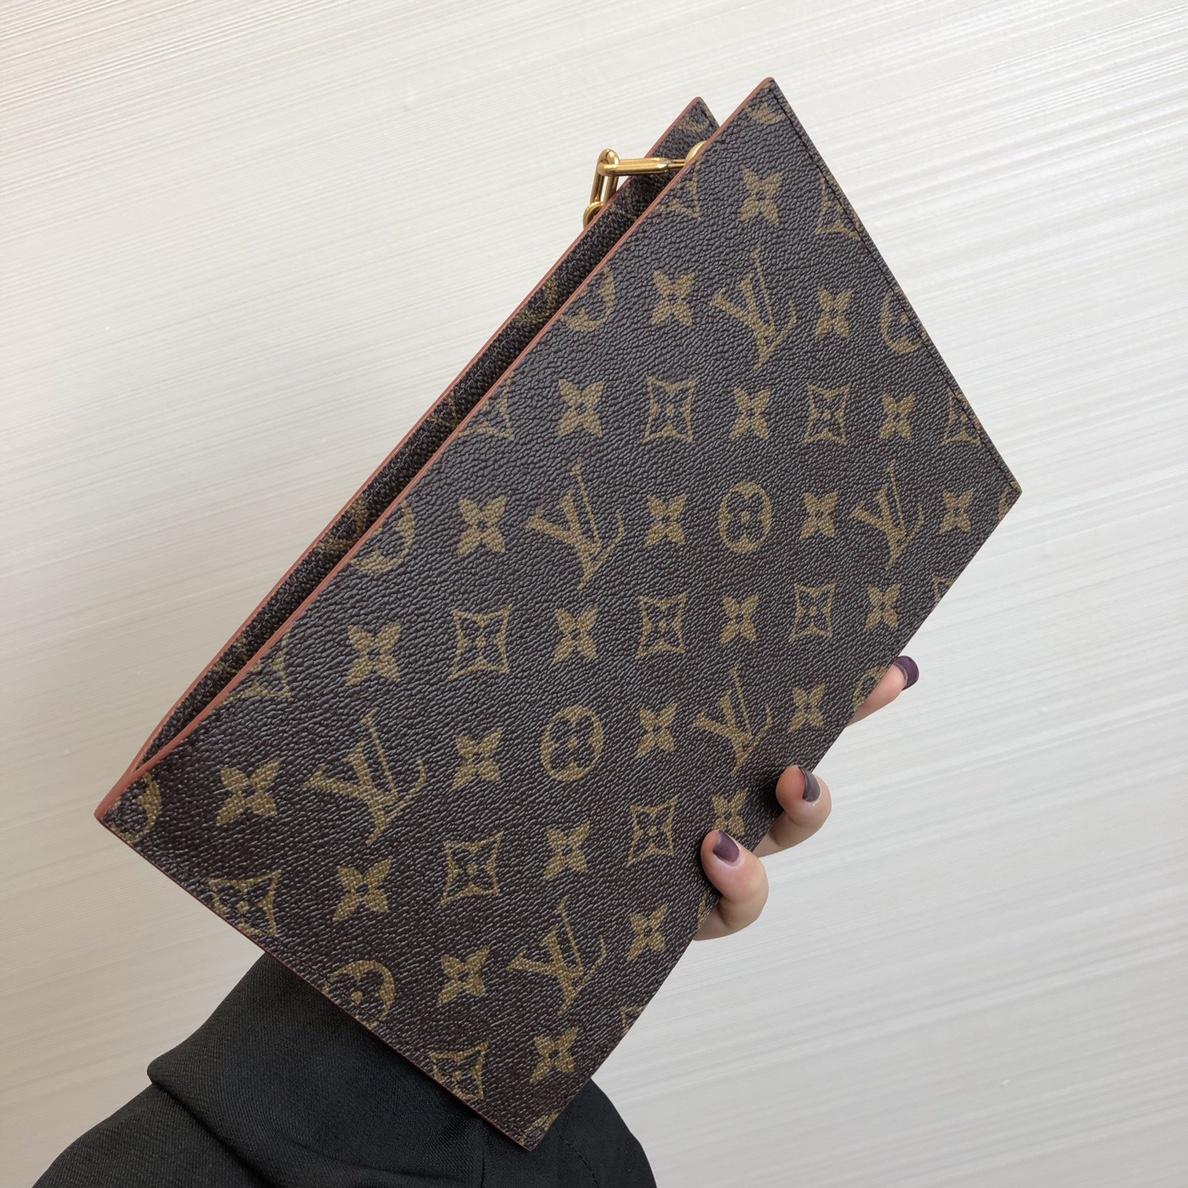 【¥750】LV包包批发 2020早春老花链条手包50154 魅力时尚